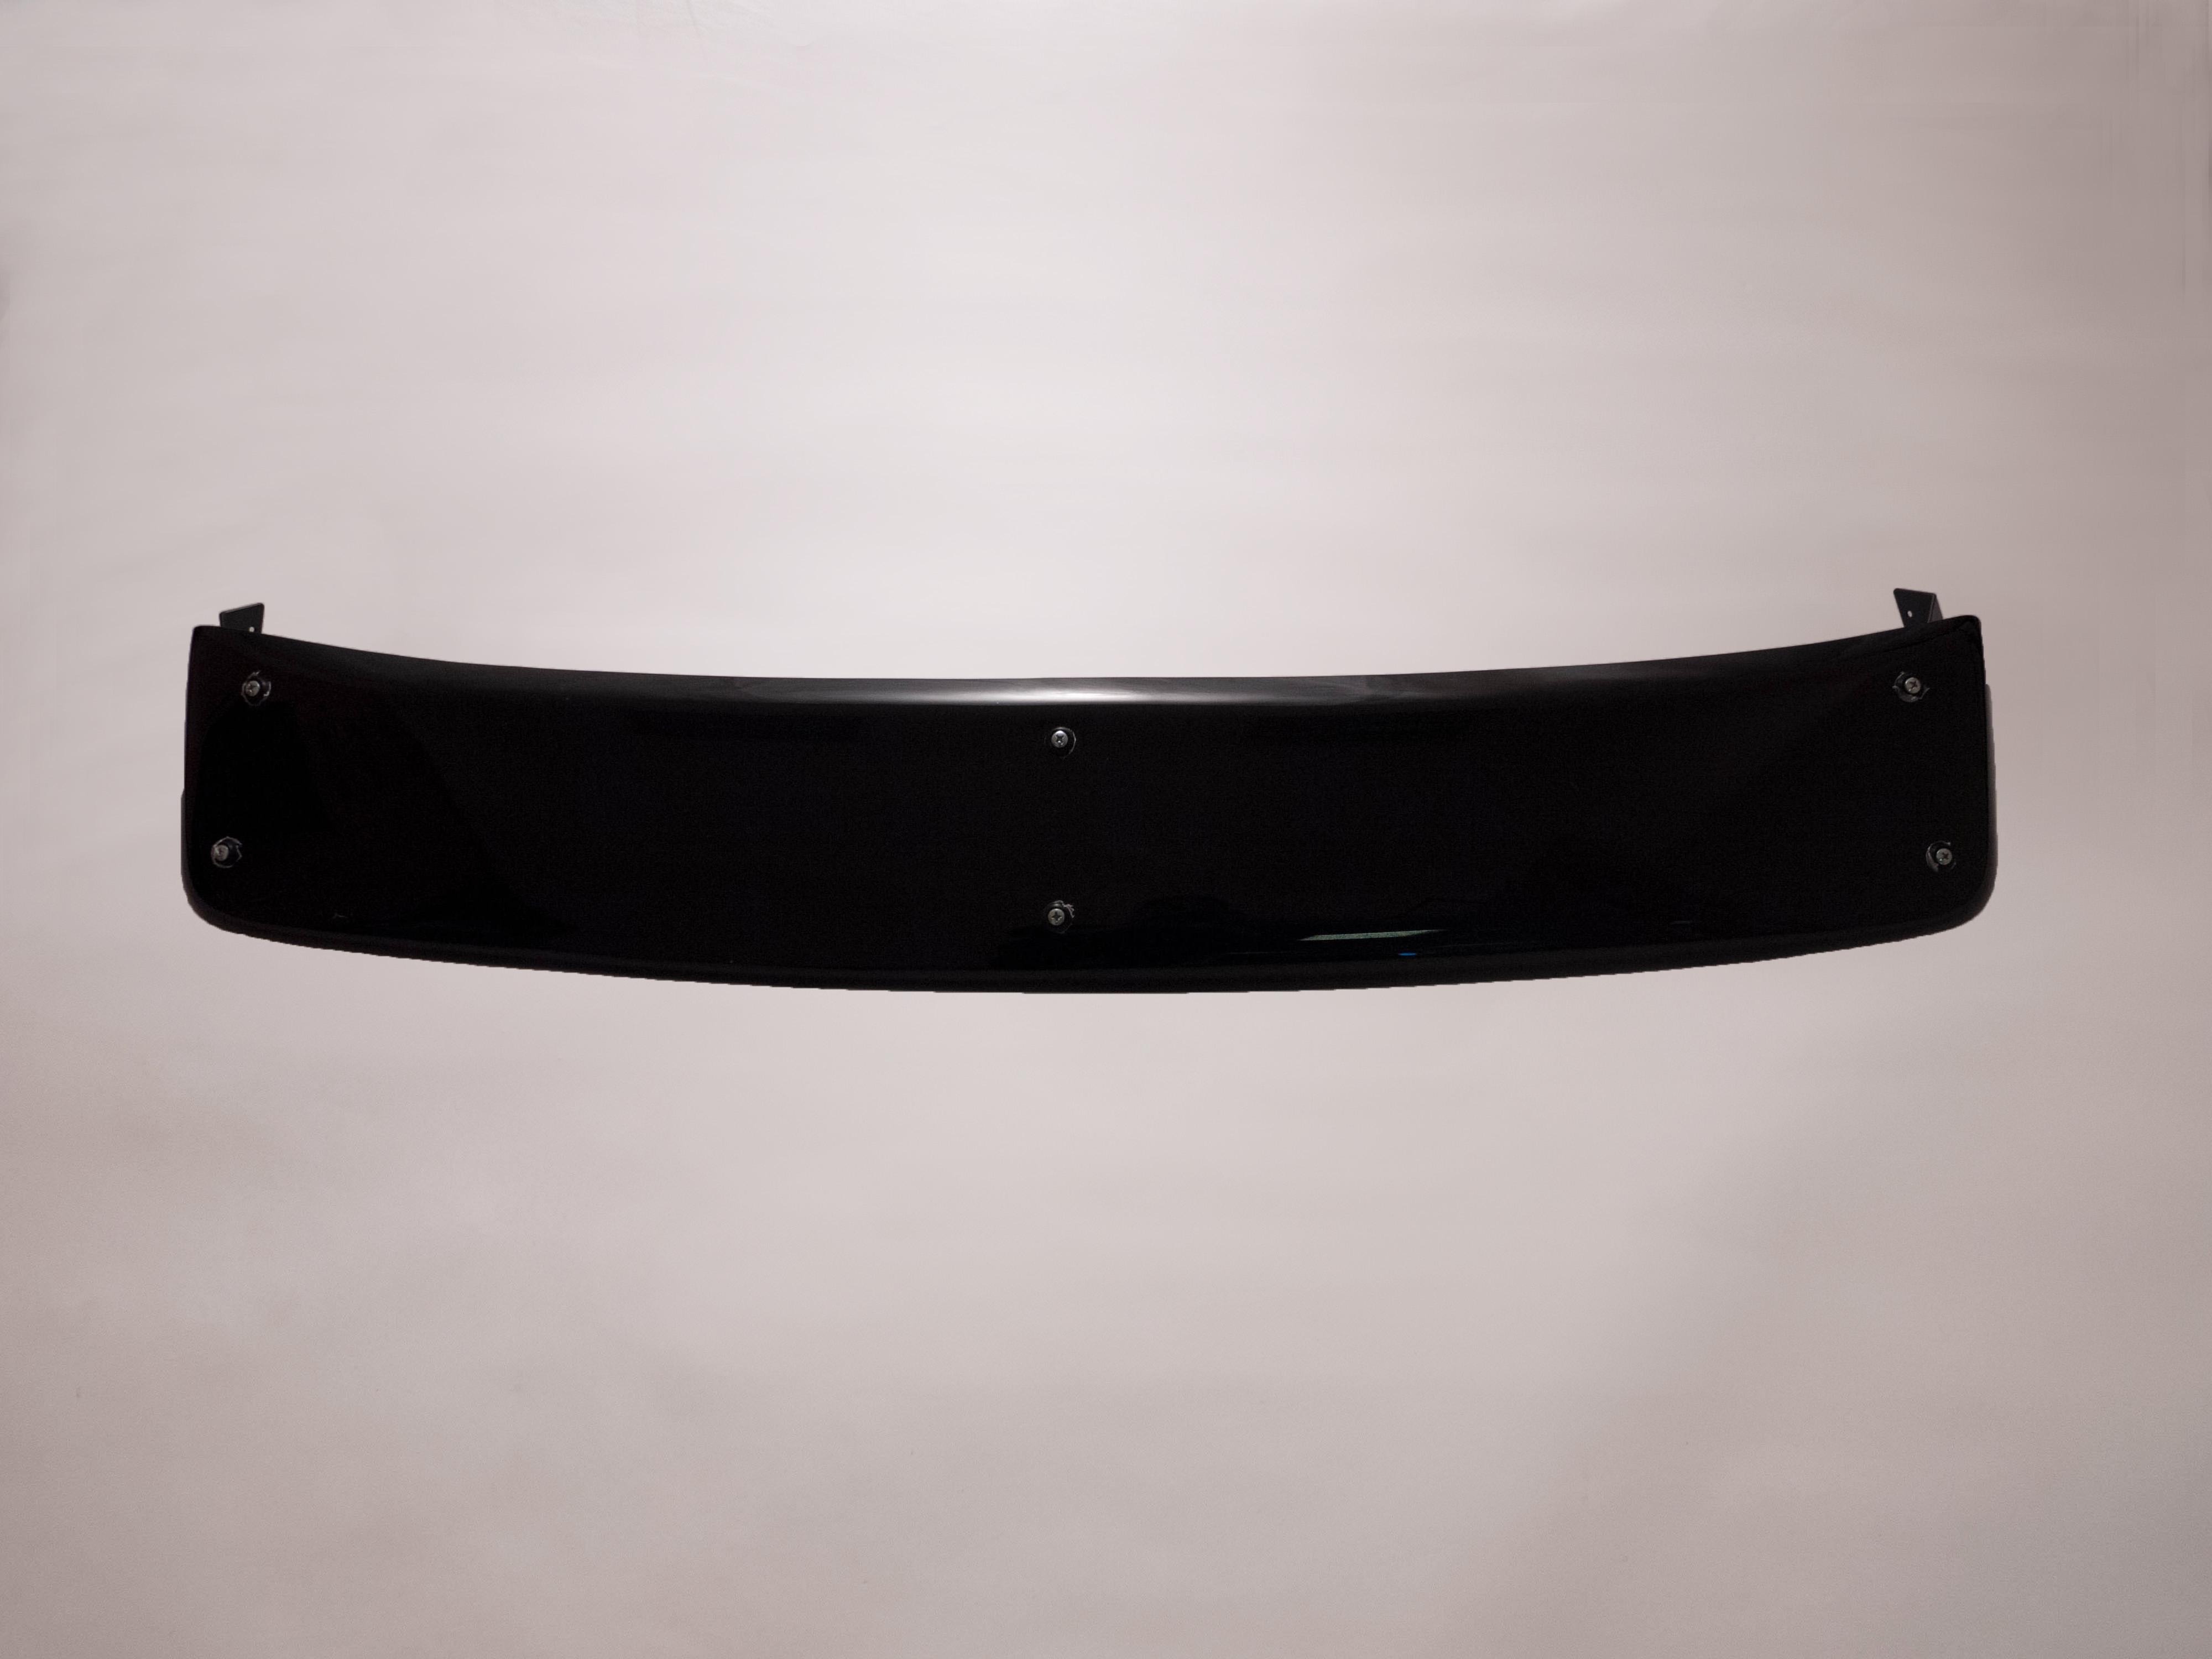 Details about Exterior Black Sun Visor Solid Acrylic Sun Shield for Mercedes  Sprinter (95-06) c0b3ffbd7ea